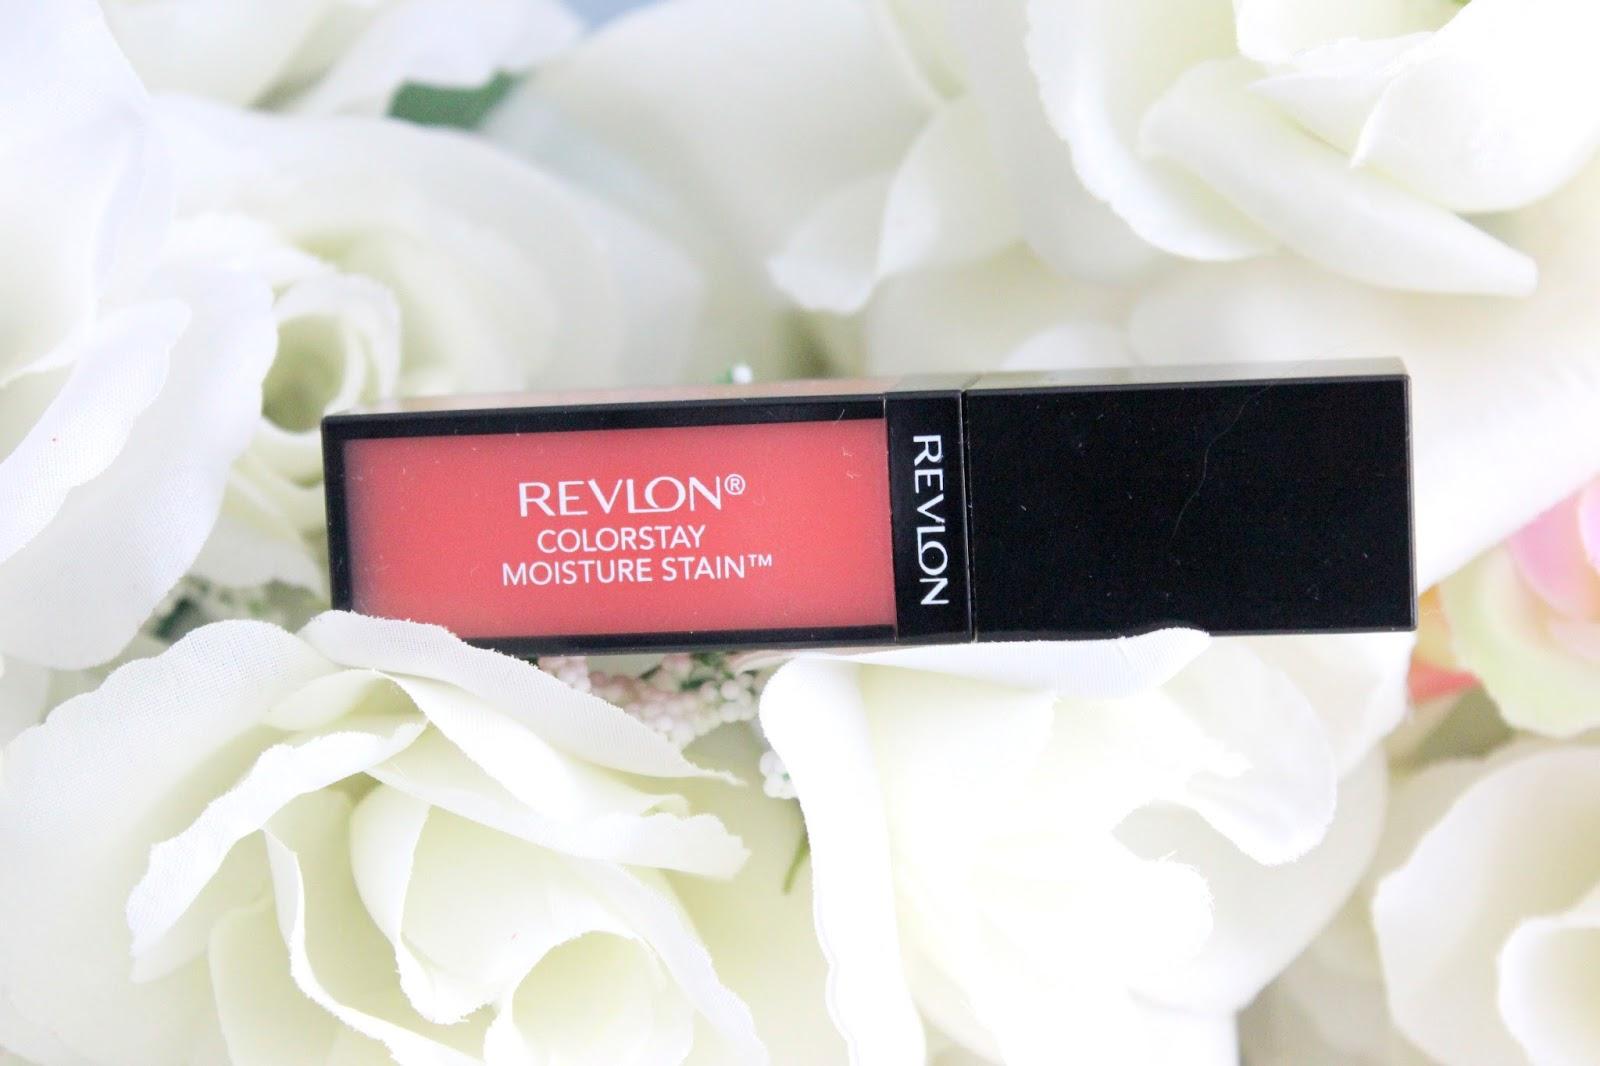 Revlon Colorstay London Posh Swatch